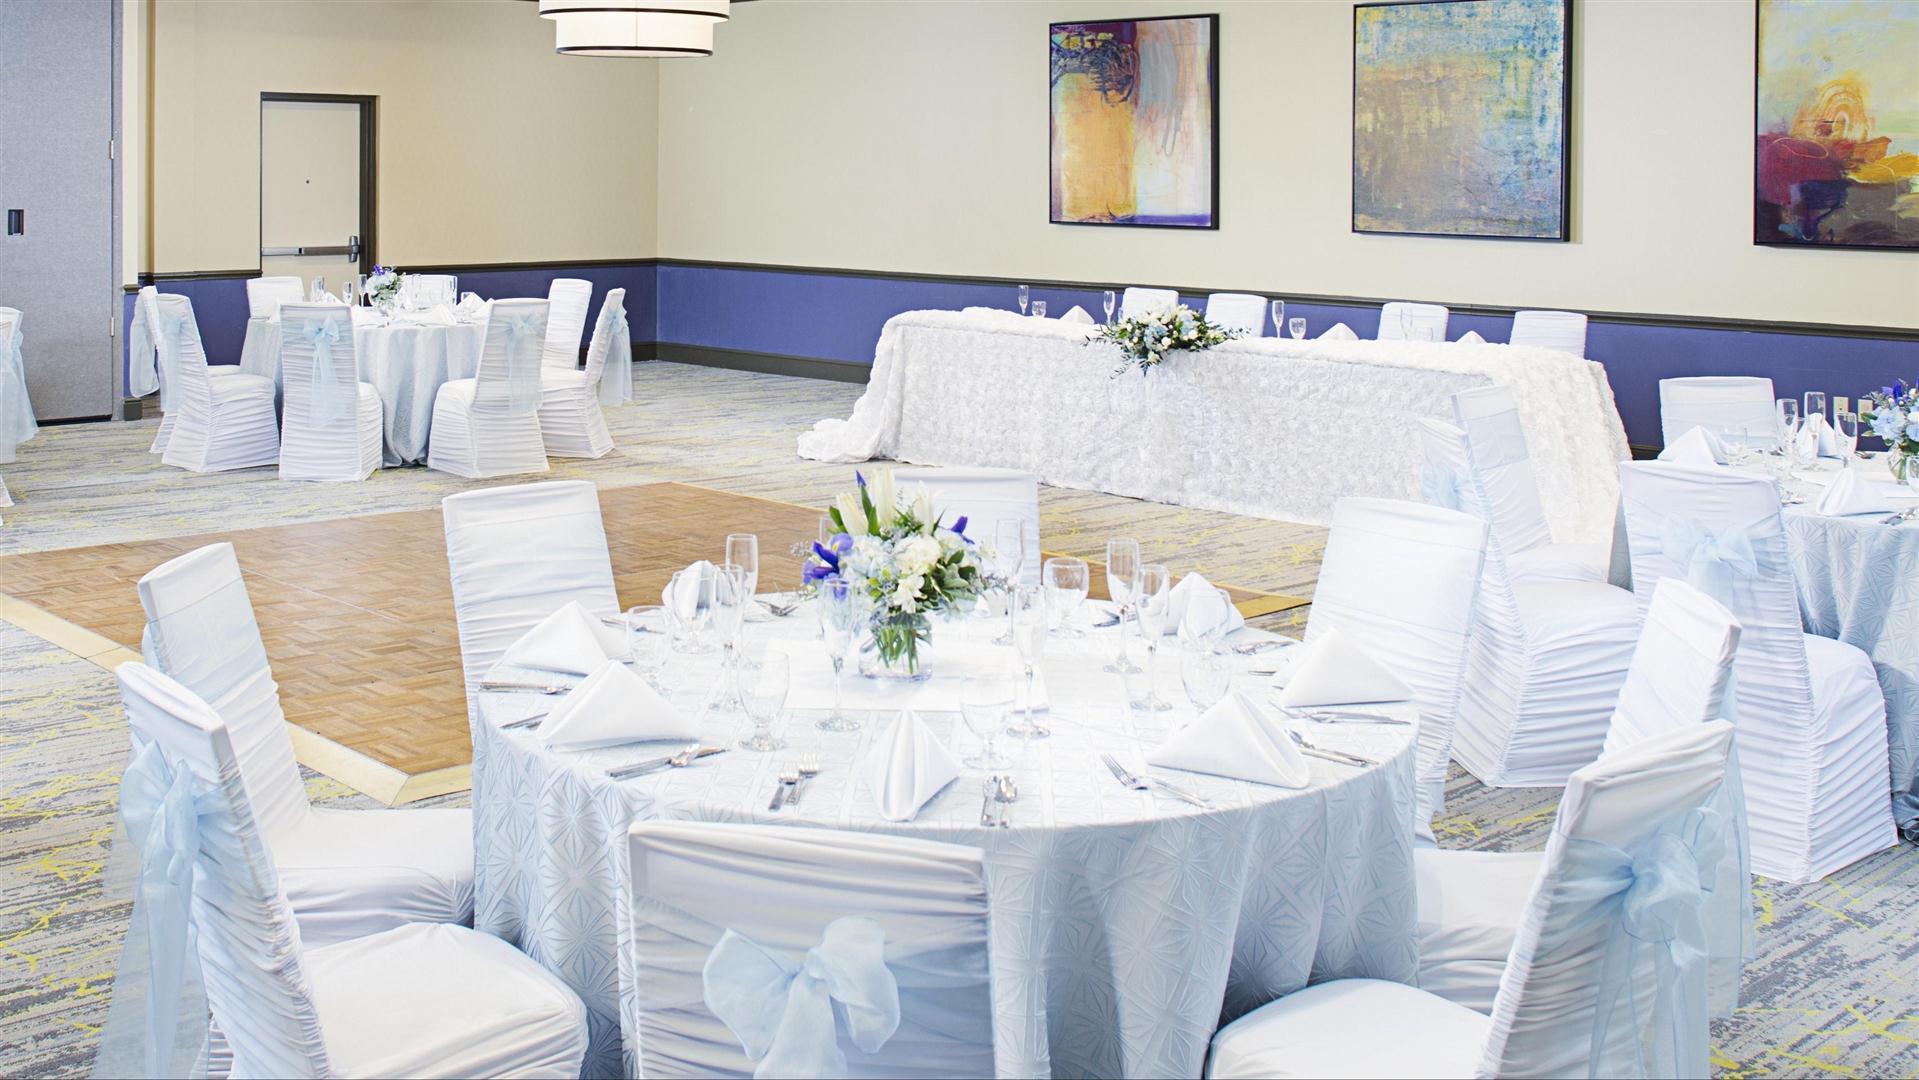 Meetings & Events at Hilton Garden Inn Hartford North Bradley Int